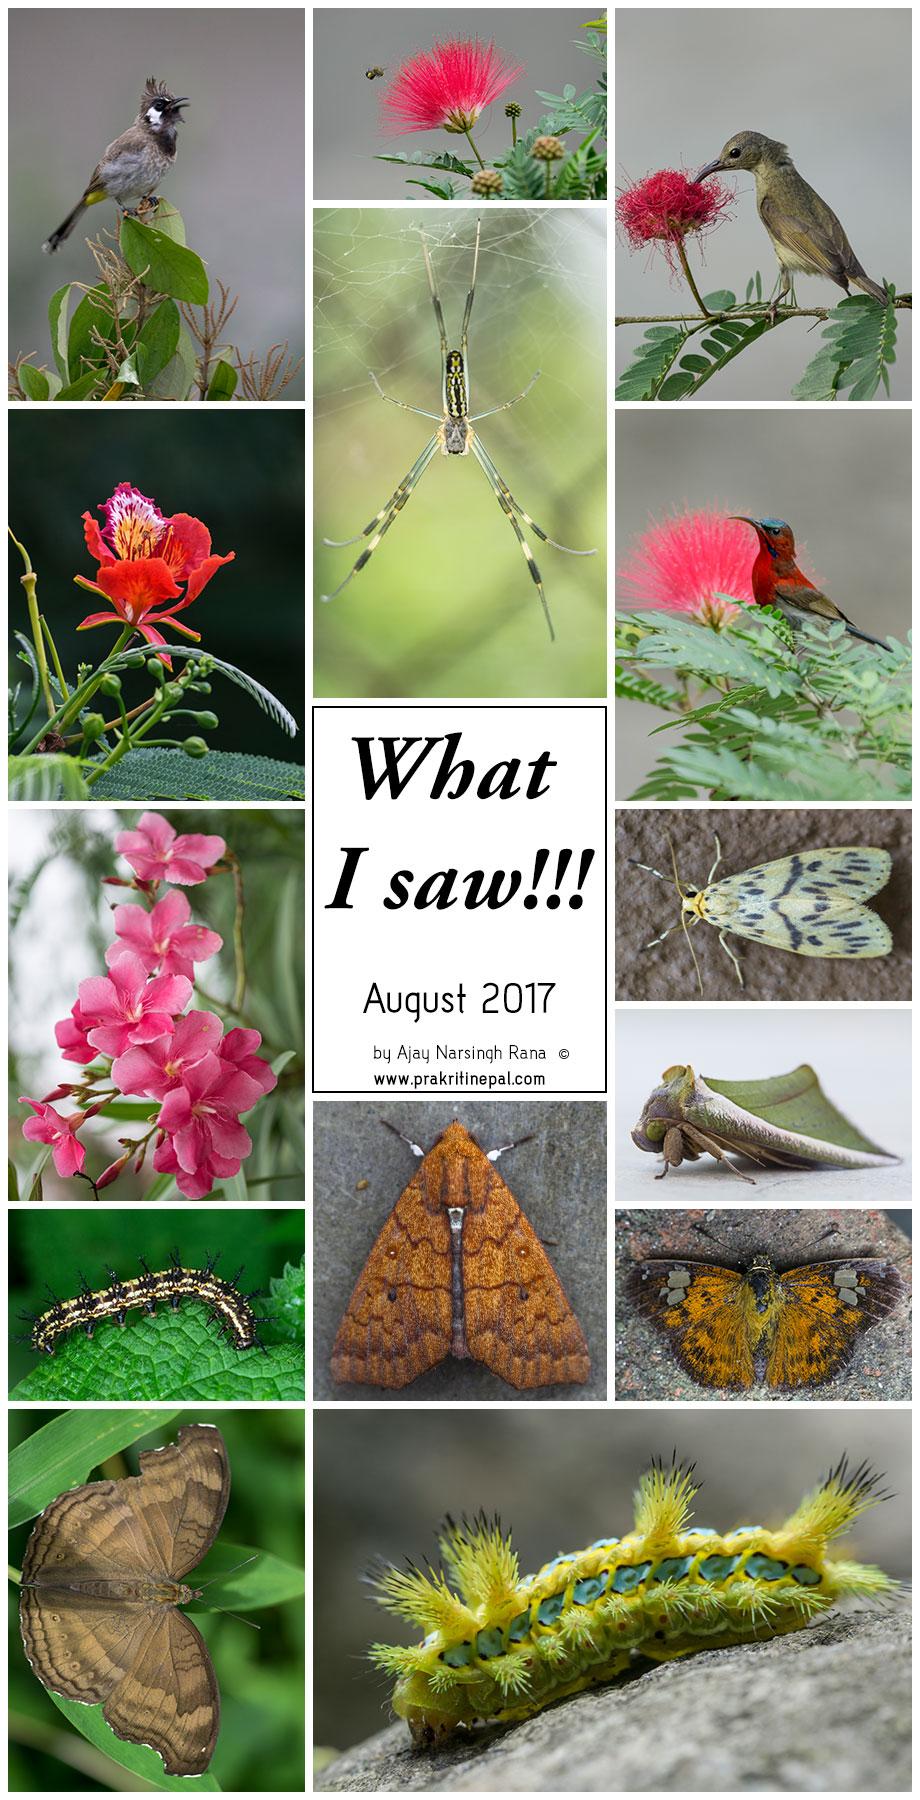 Prakriti-Nepal_What-i-saw-in-August-2017